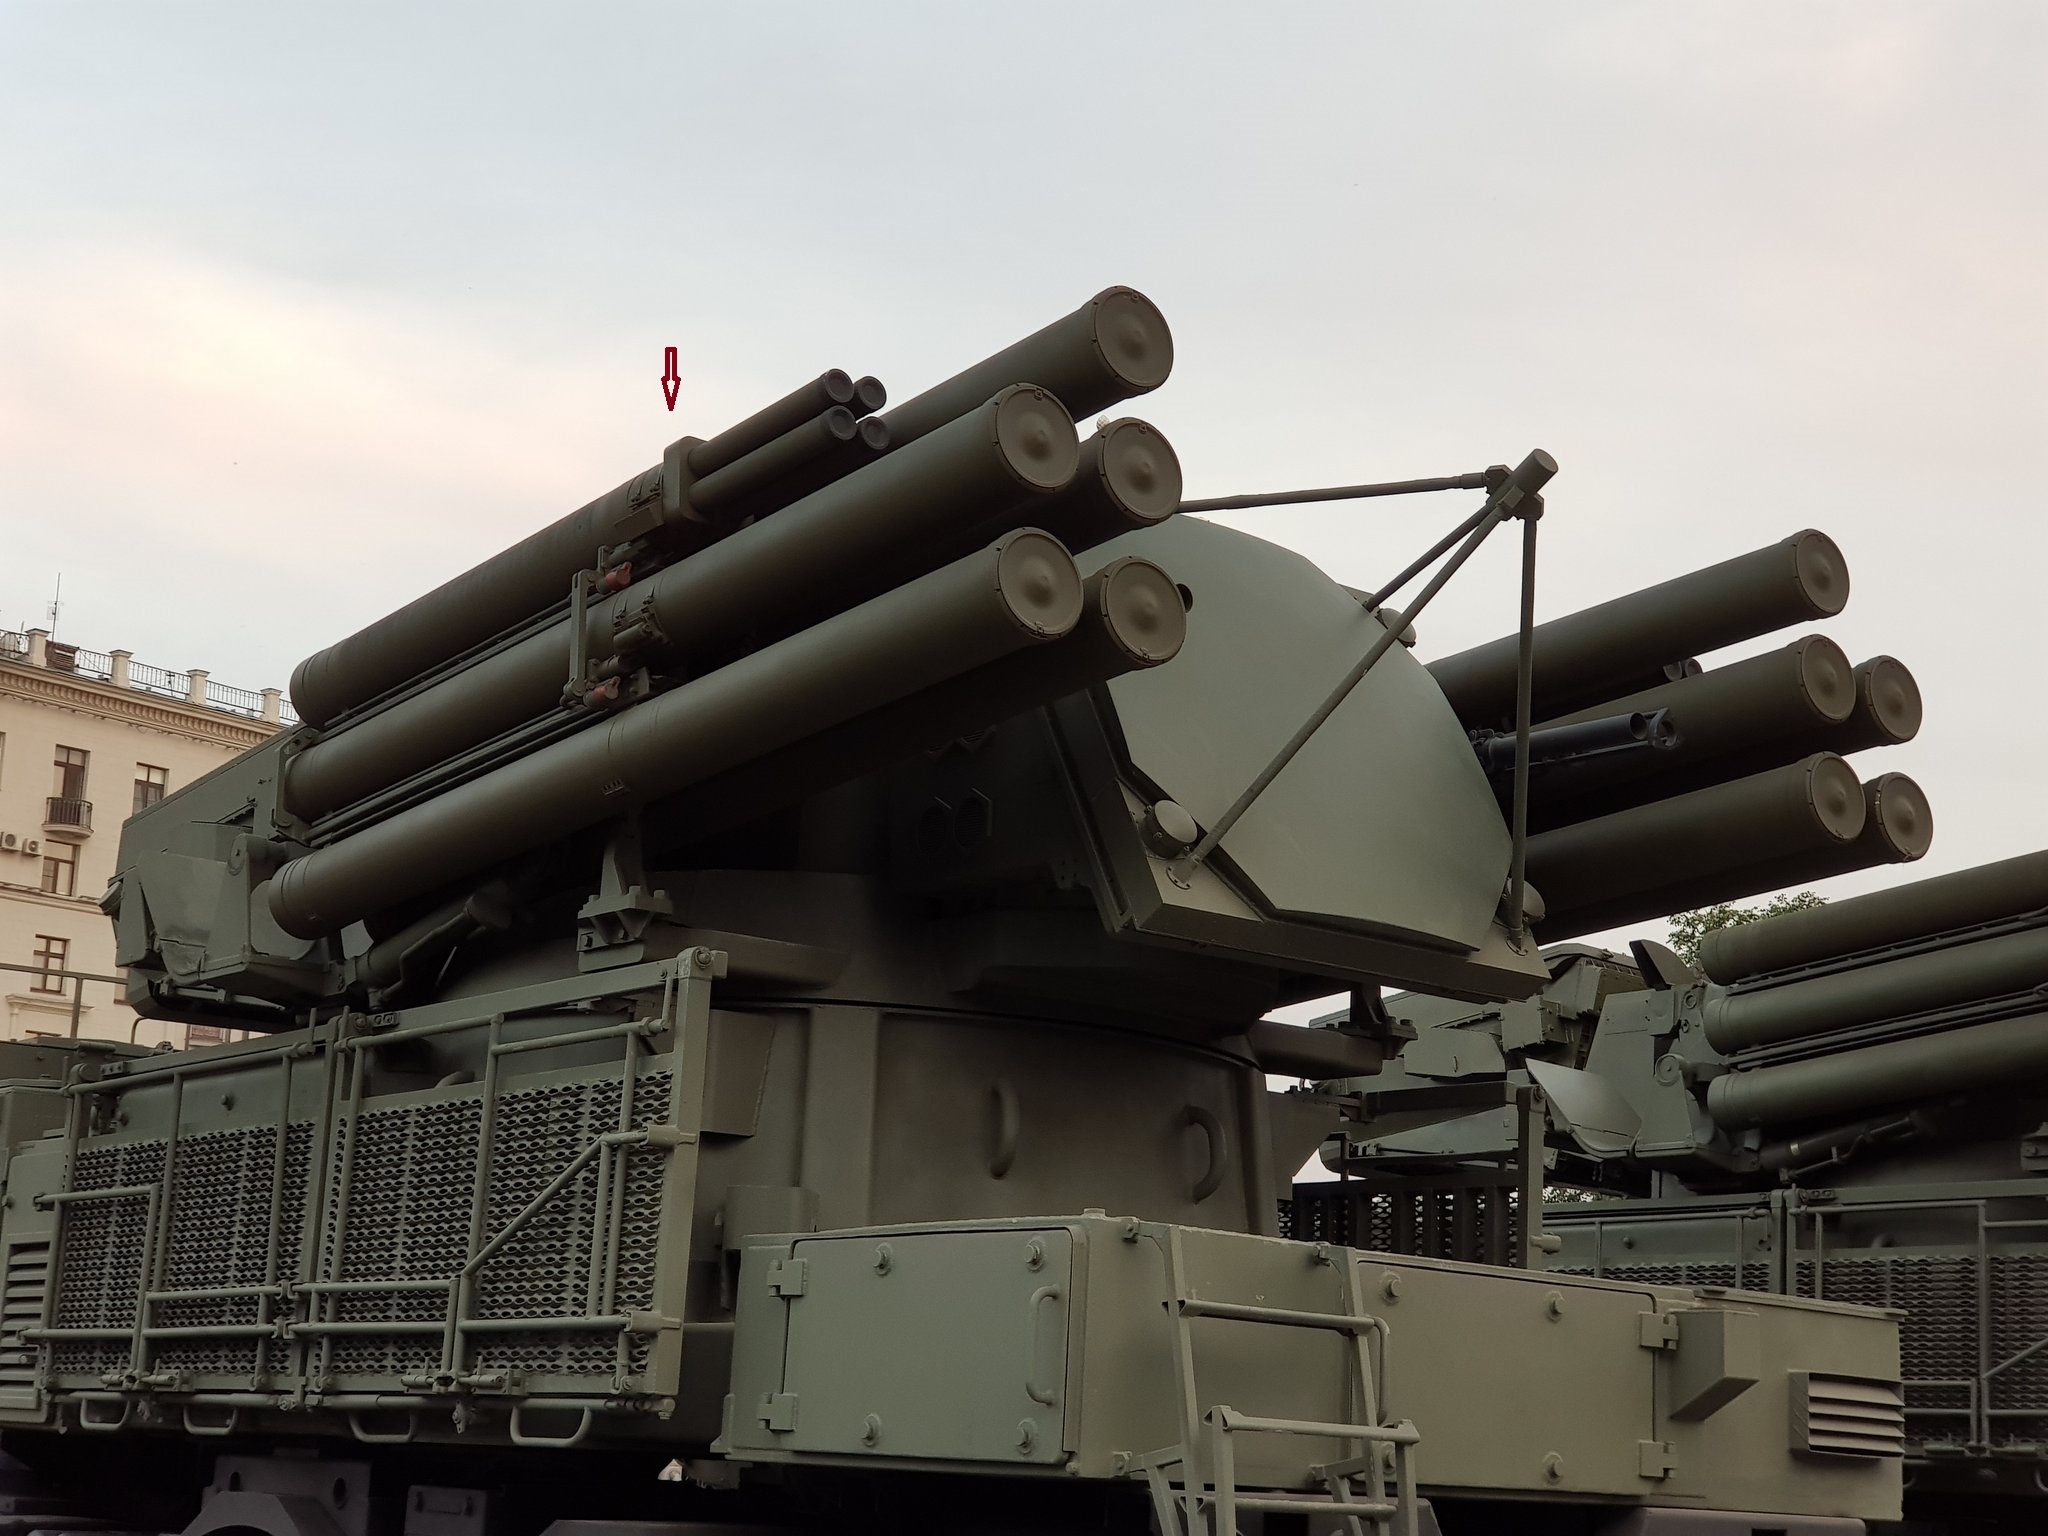 Pantsir missile/gun AD system Thread: #2 - Page 8 EavhXILUcAAS1EC?format=jpg&name=large